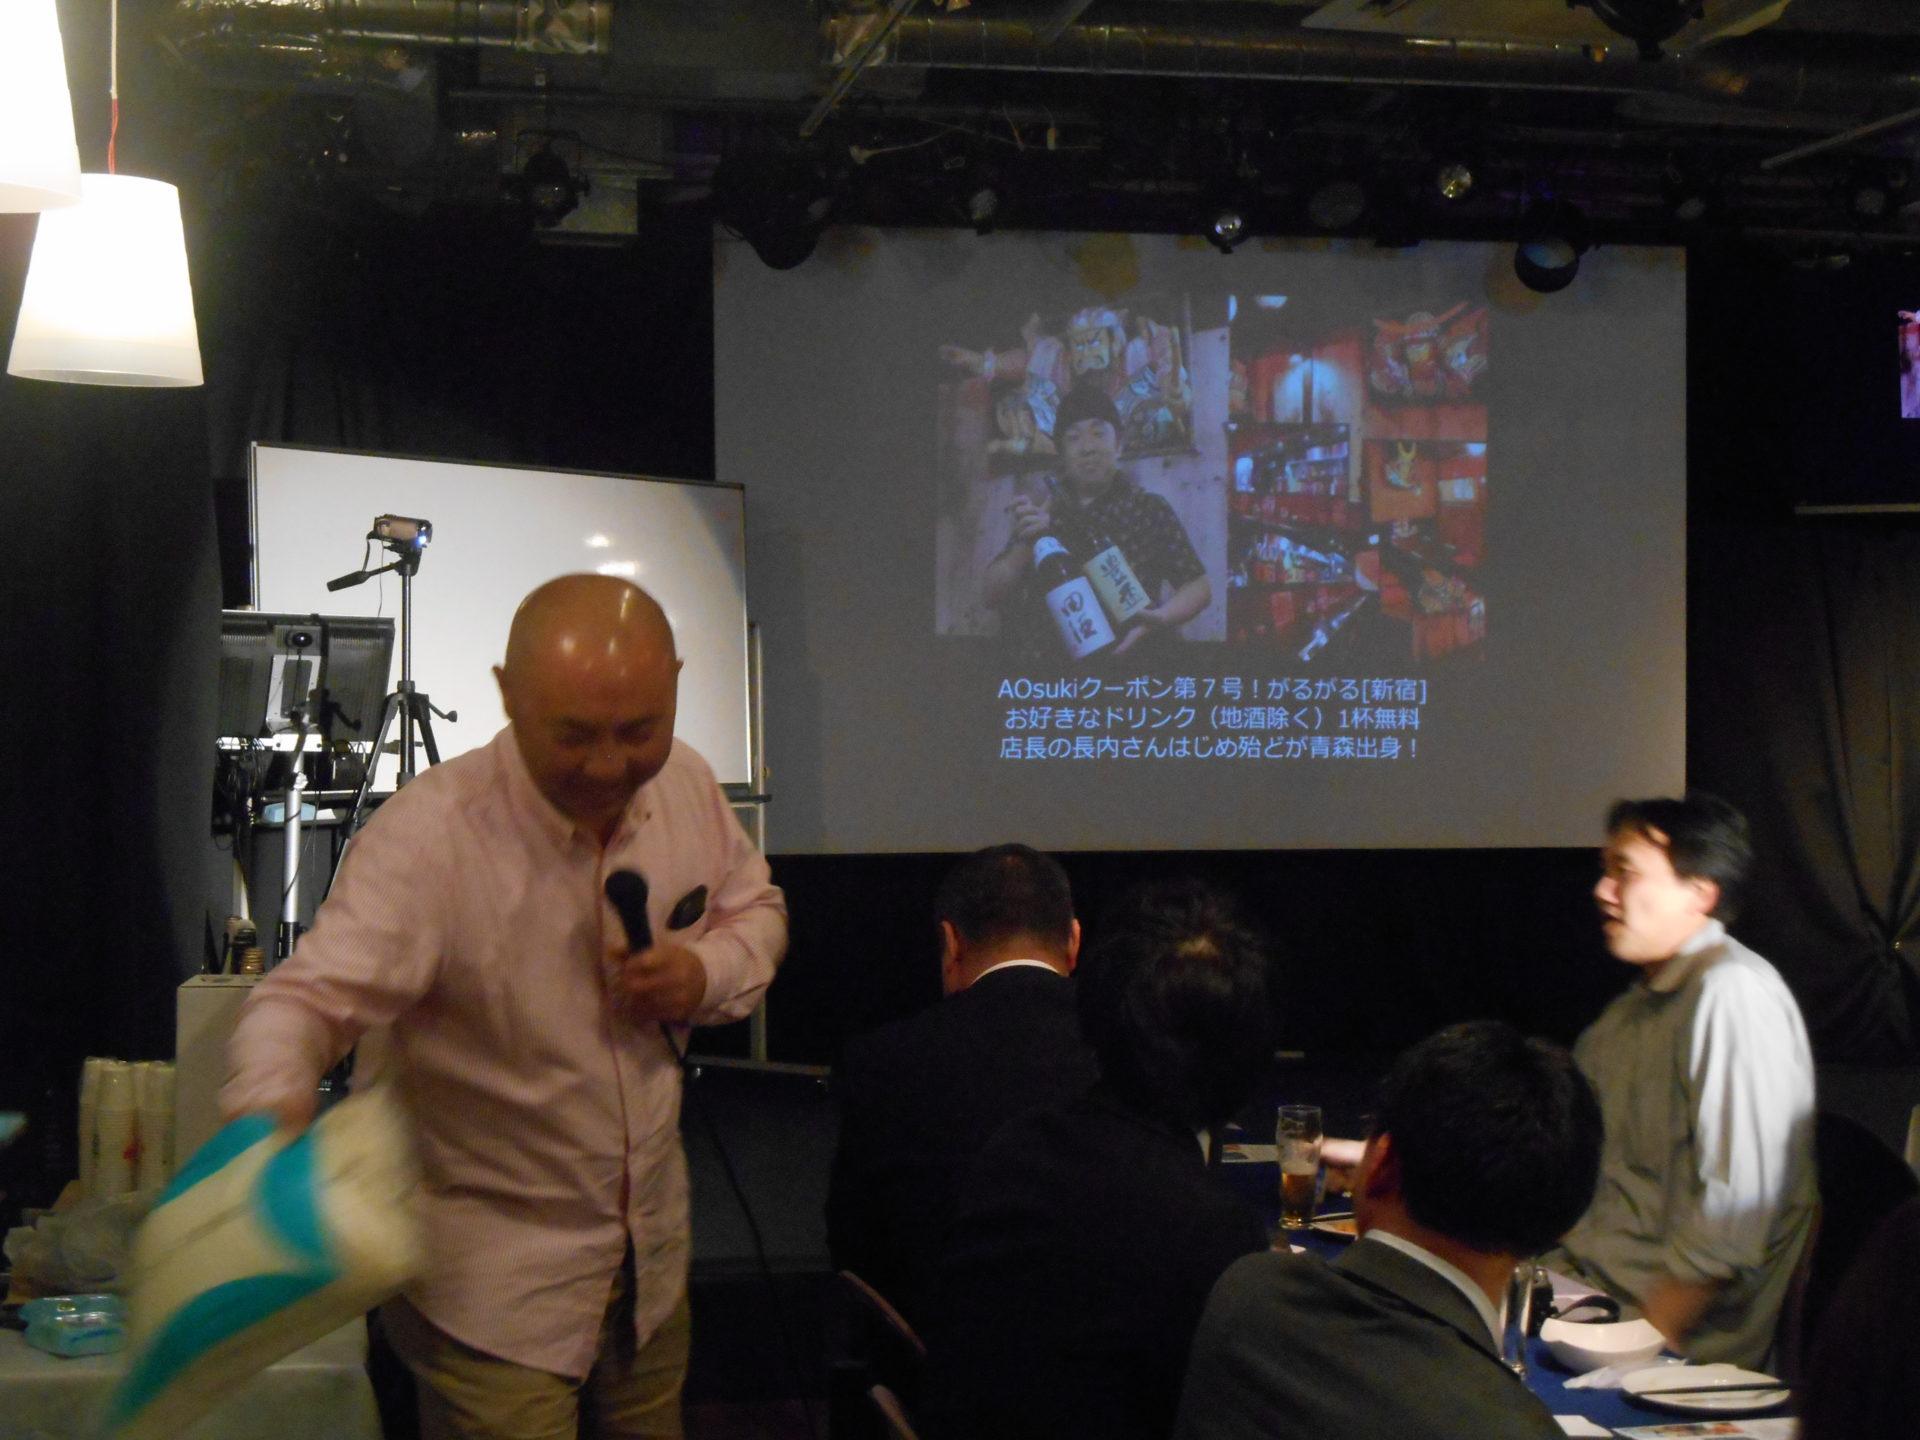 DSCN1069 1920x1440 - 2016年3月11日(金)AOsuki総会&パーティー開催しました。